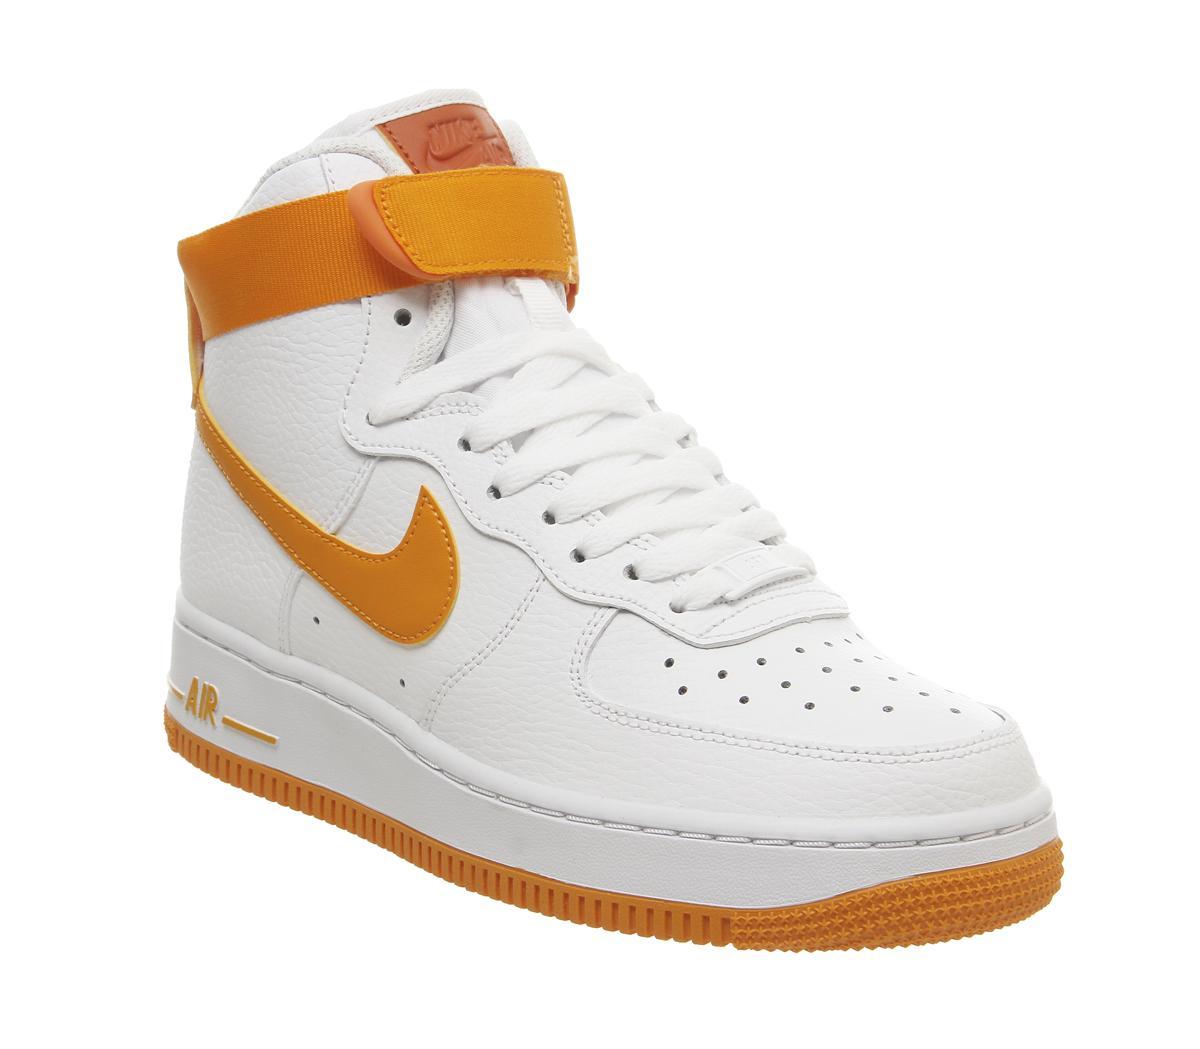 Nike Air Force 1 Hi White Orange Peel